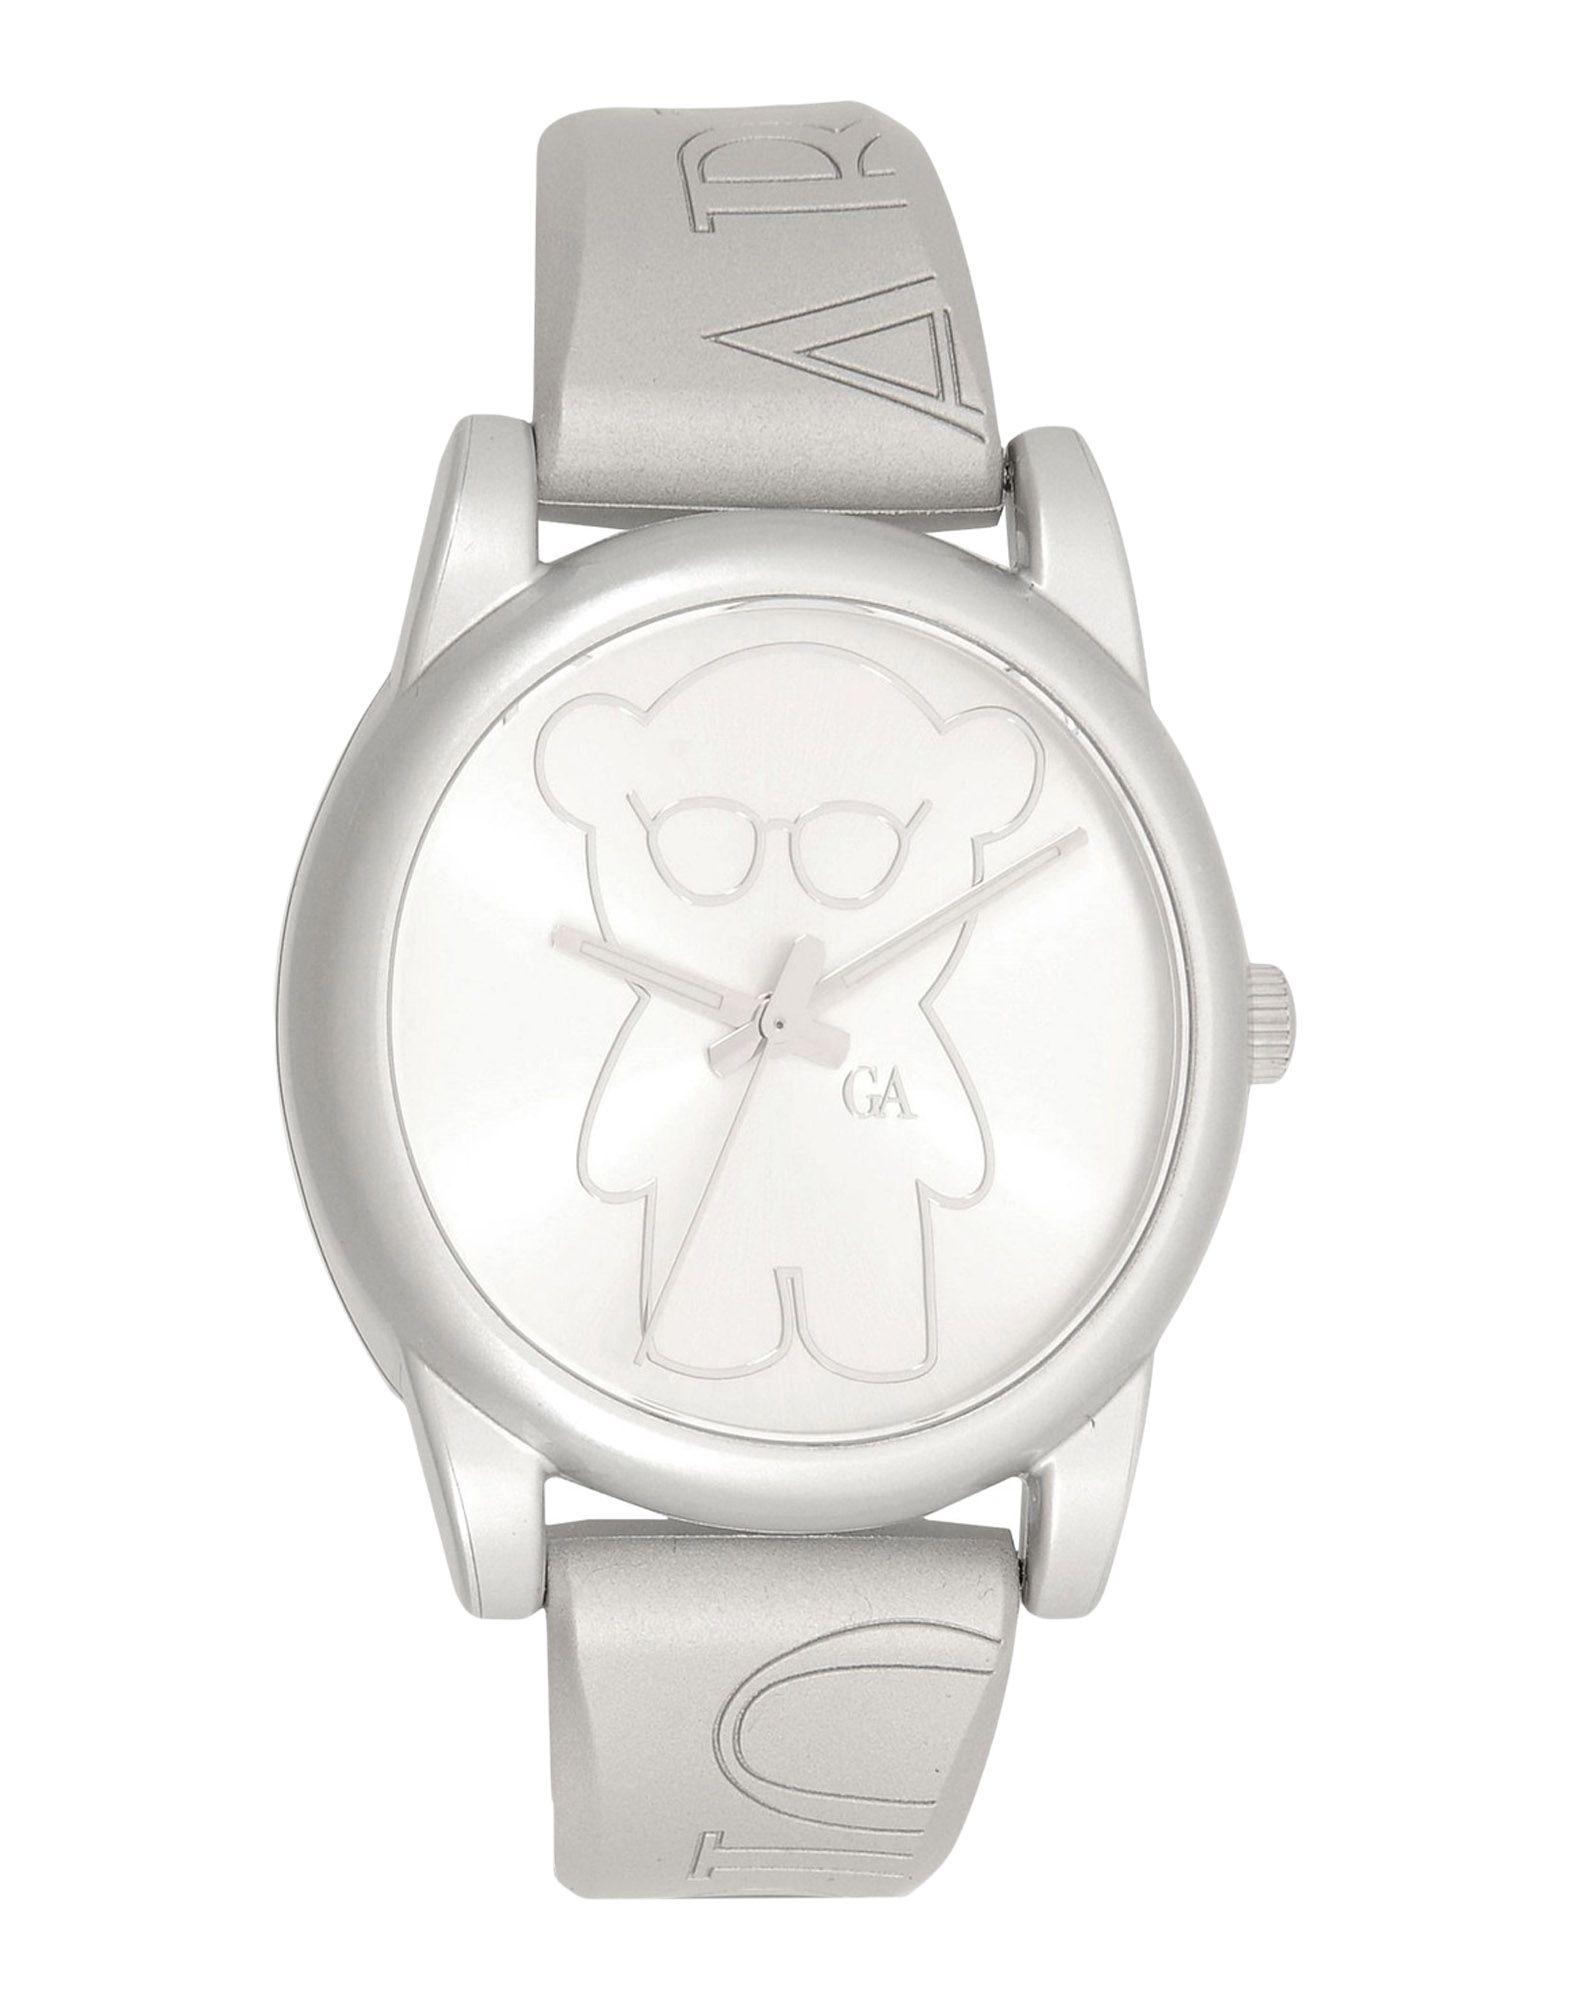 EMPORIO ARMANI Unisex Armbanduhr Farbe Silber Größe 1 - broschei